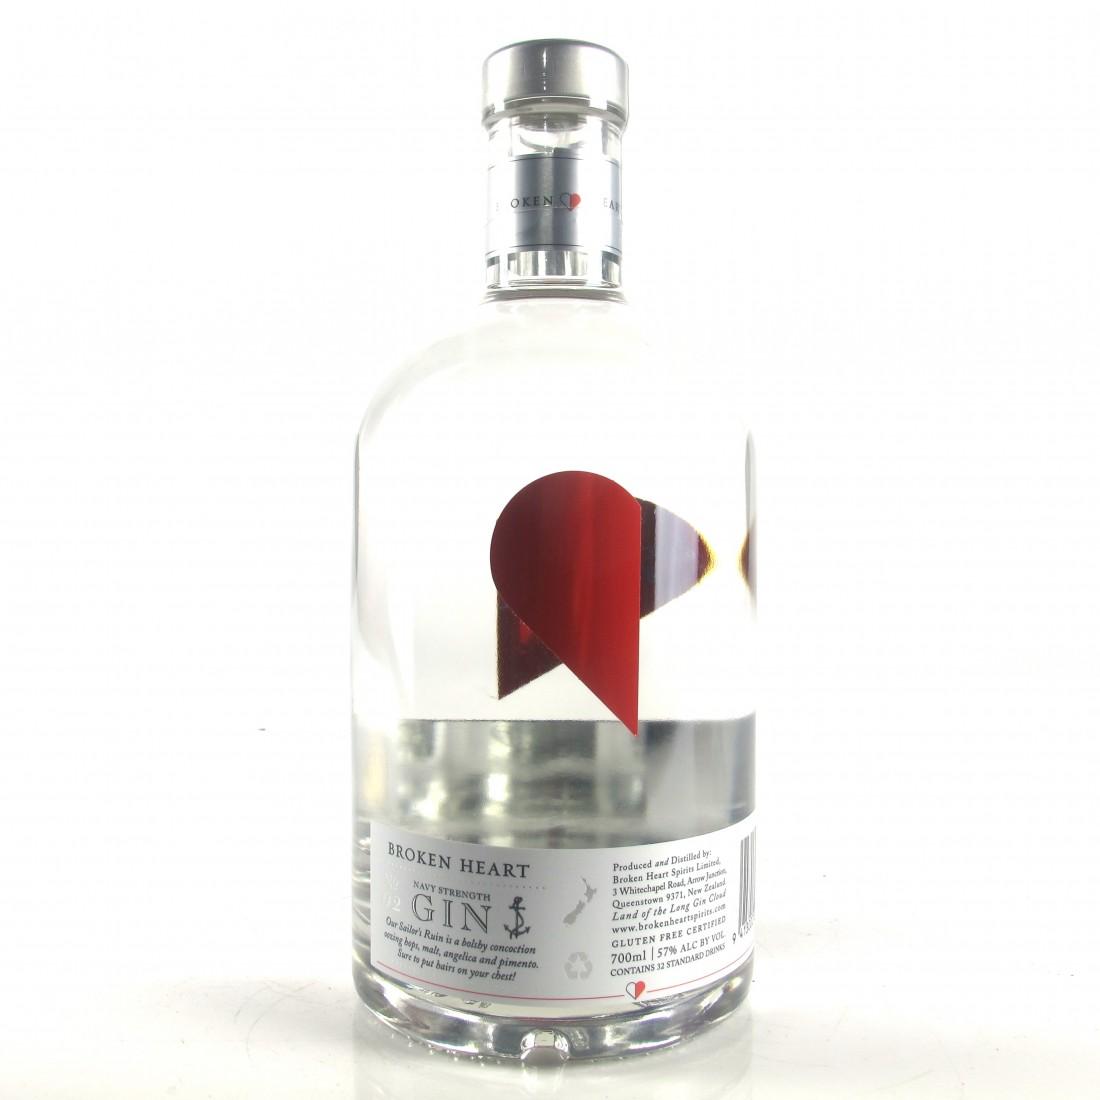 Broken Heart Navy Strength New Zealand Gin